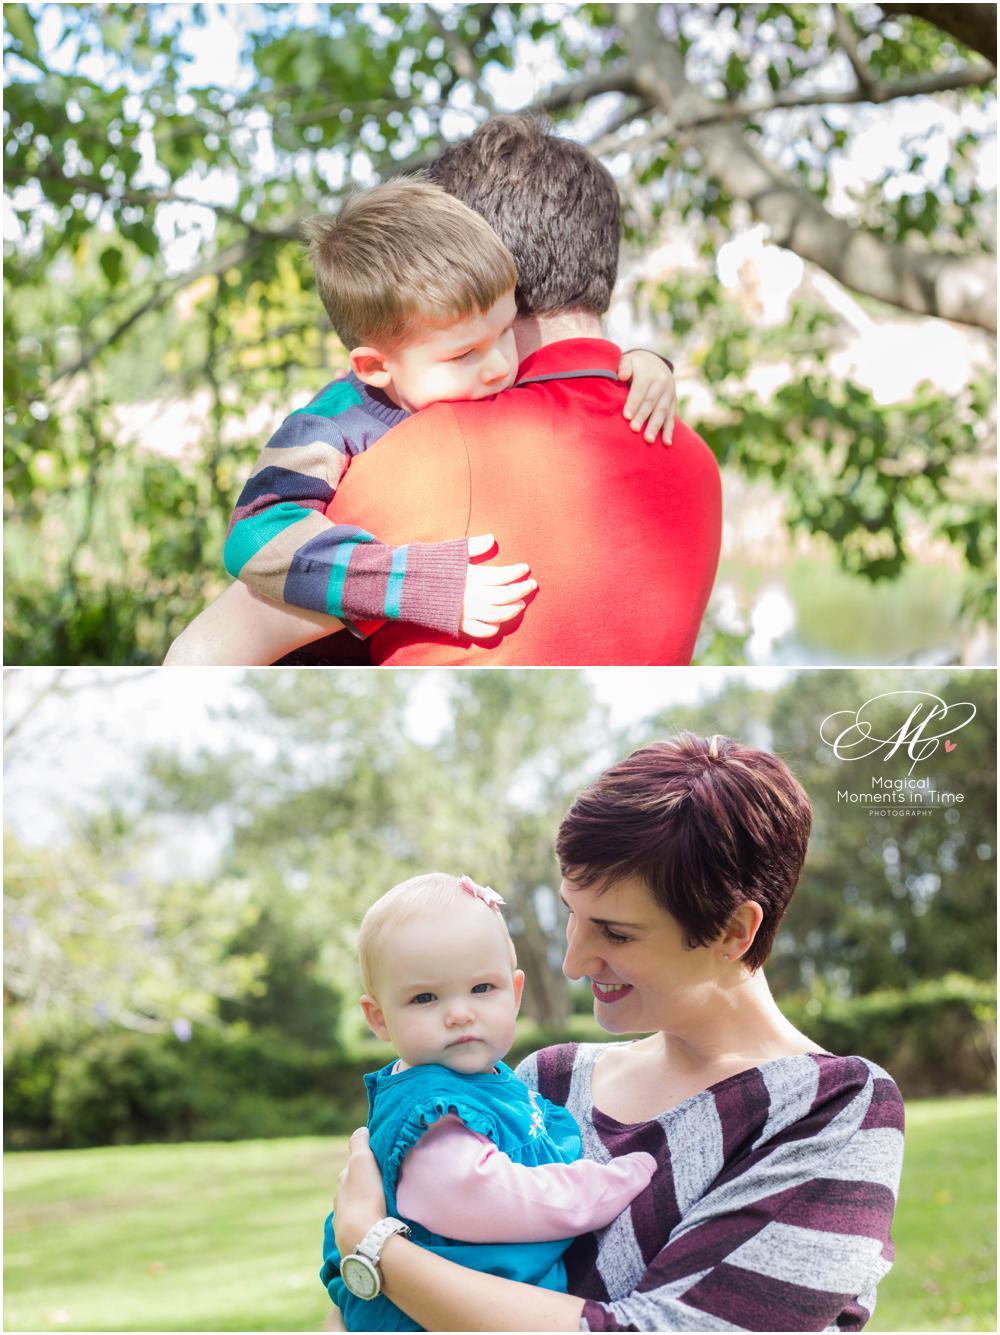 durban family photography children